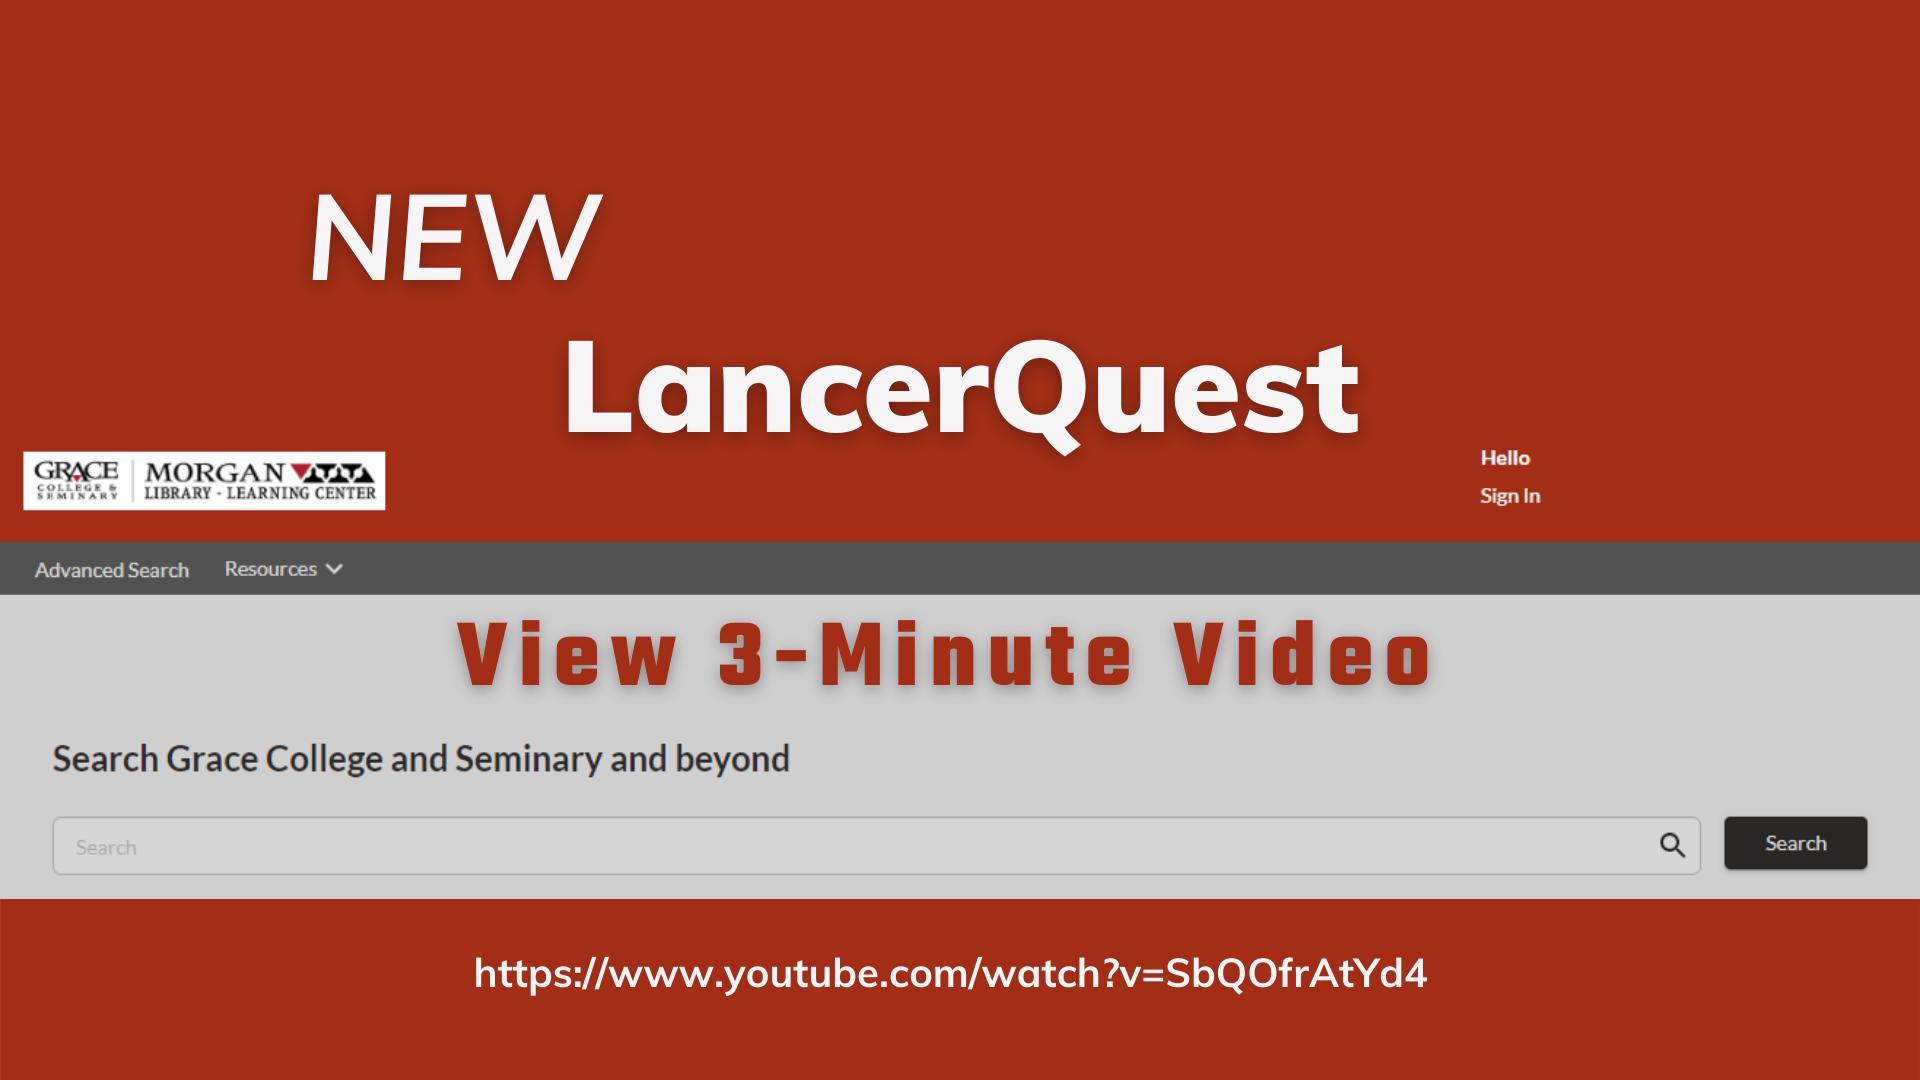 New LancerQuest